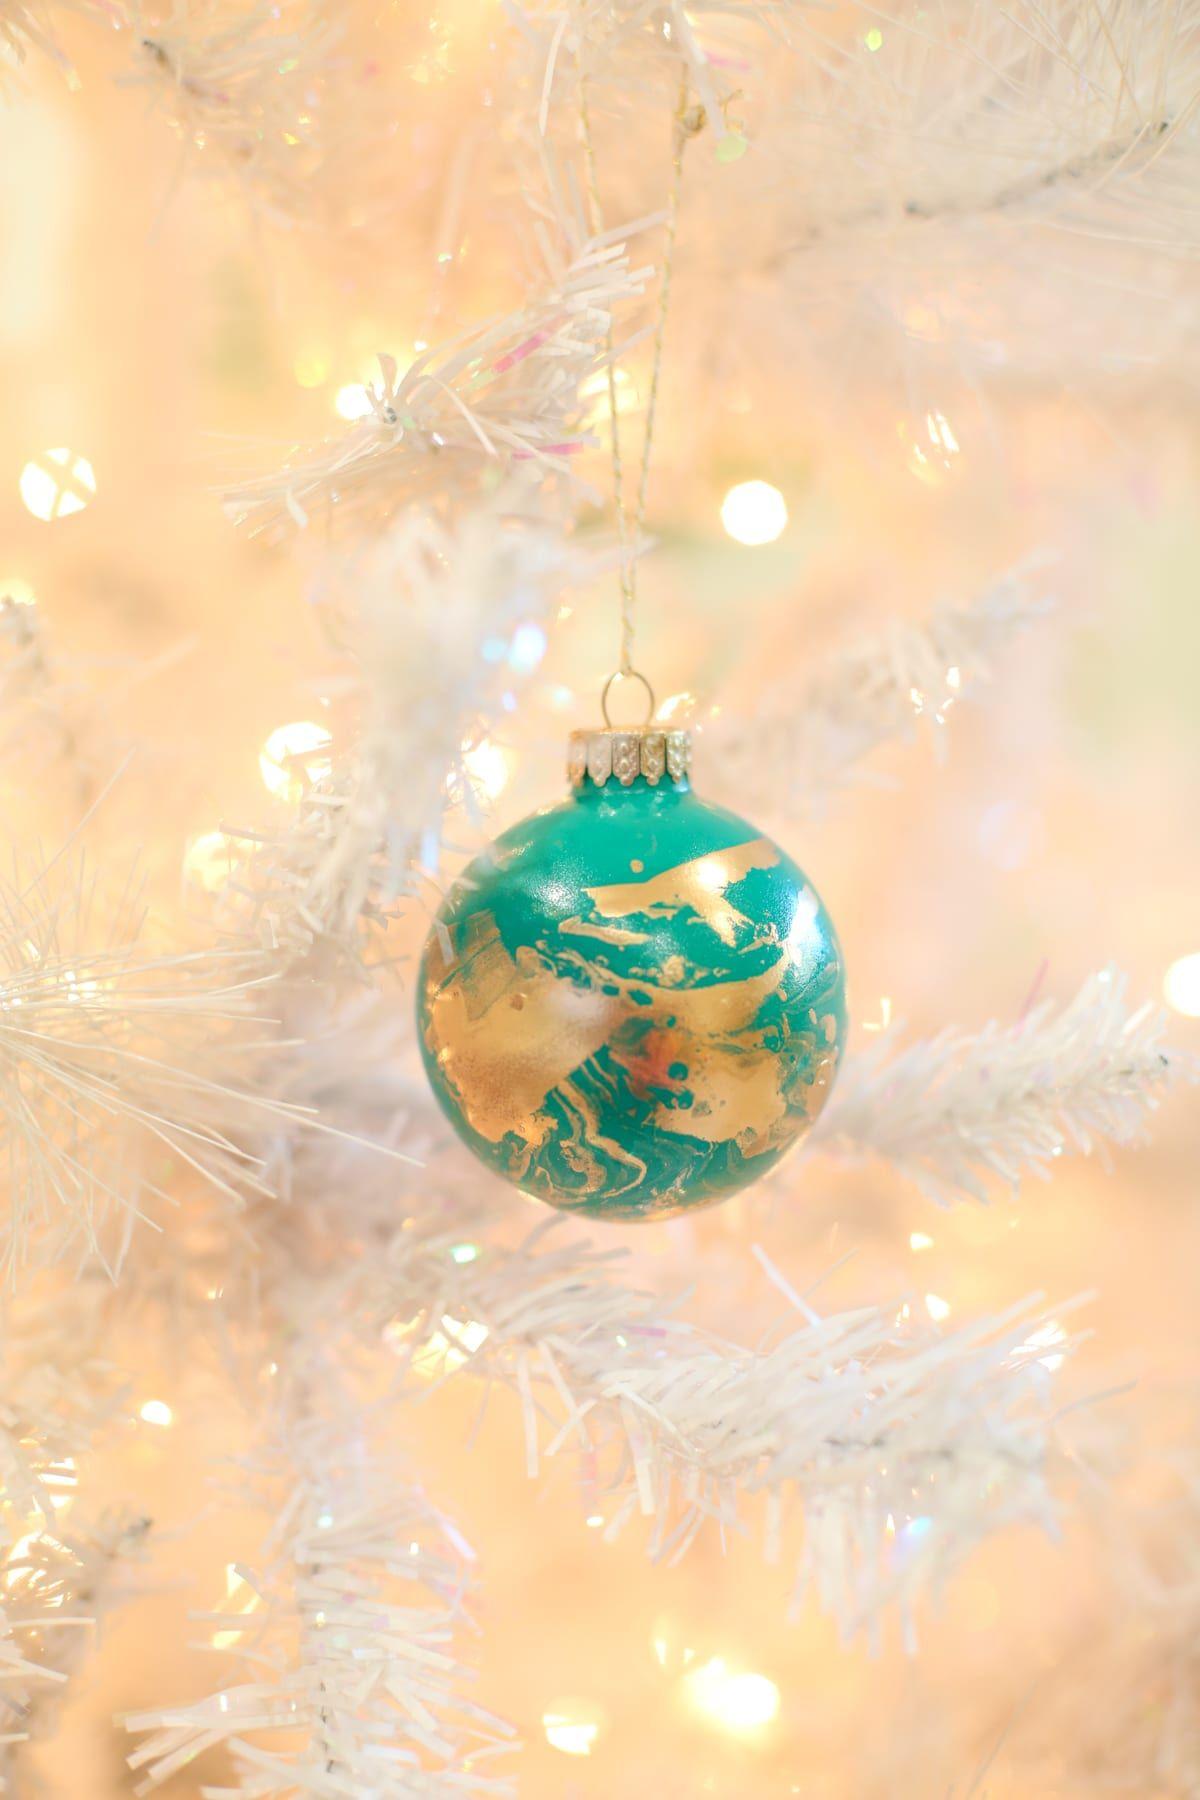 40 Diy Christmas Ornament Ideas Best Homemade Christmas Tree Ornaments